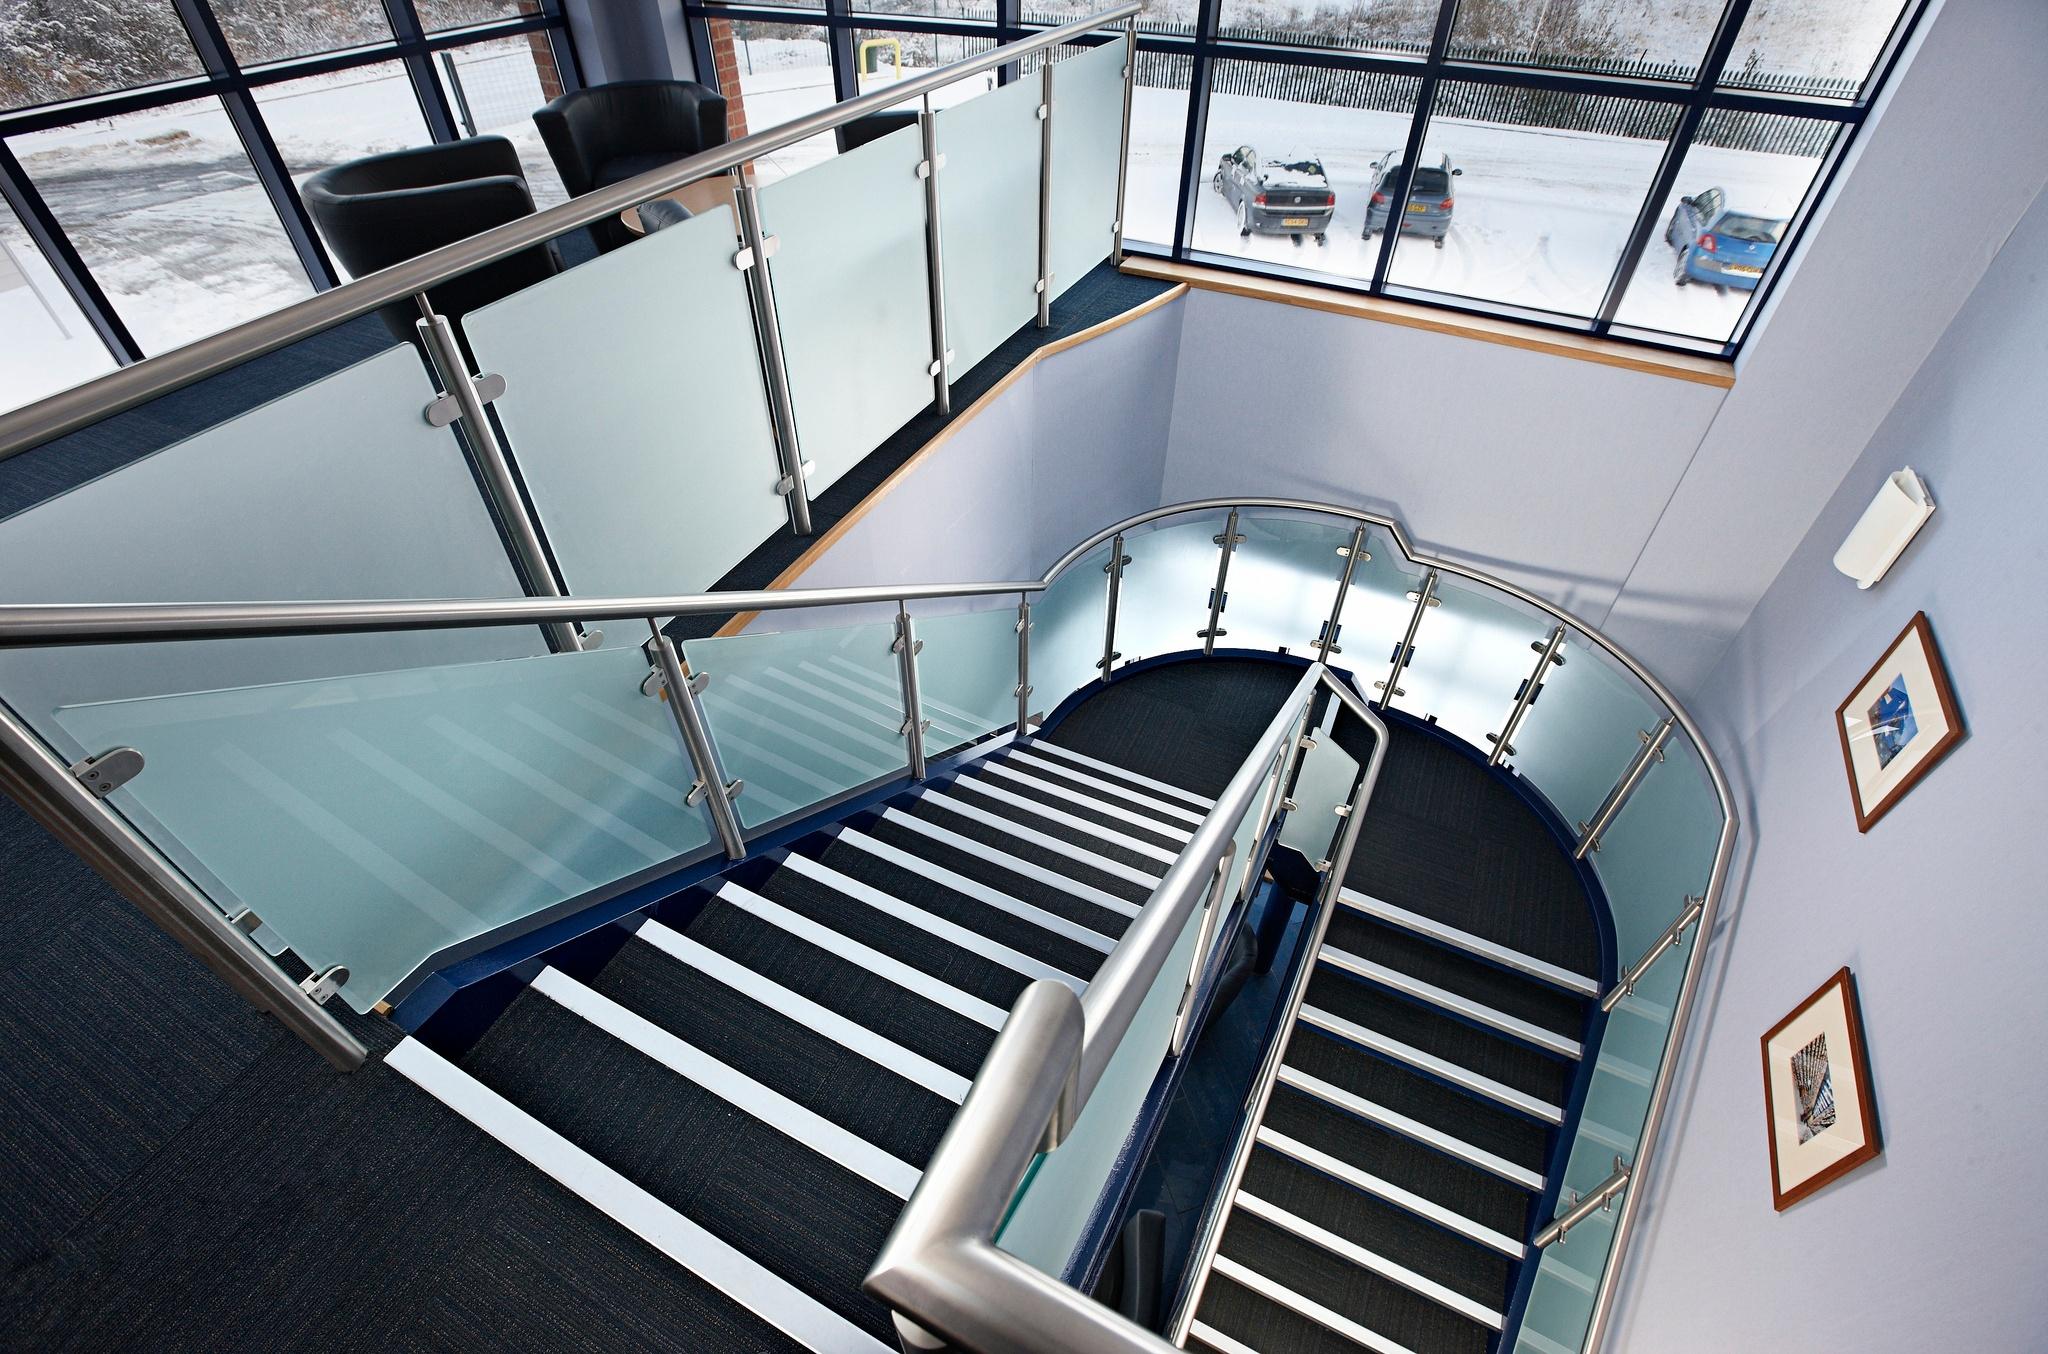 elite aluminum stair nosing.jpg